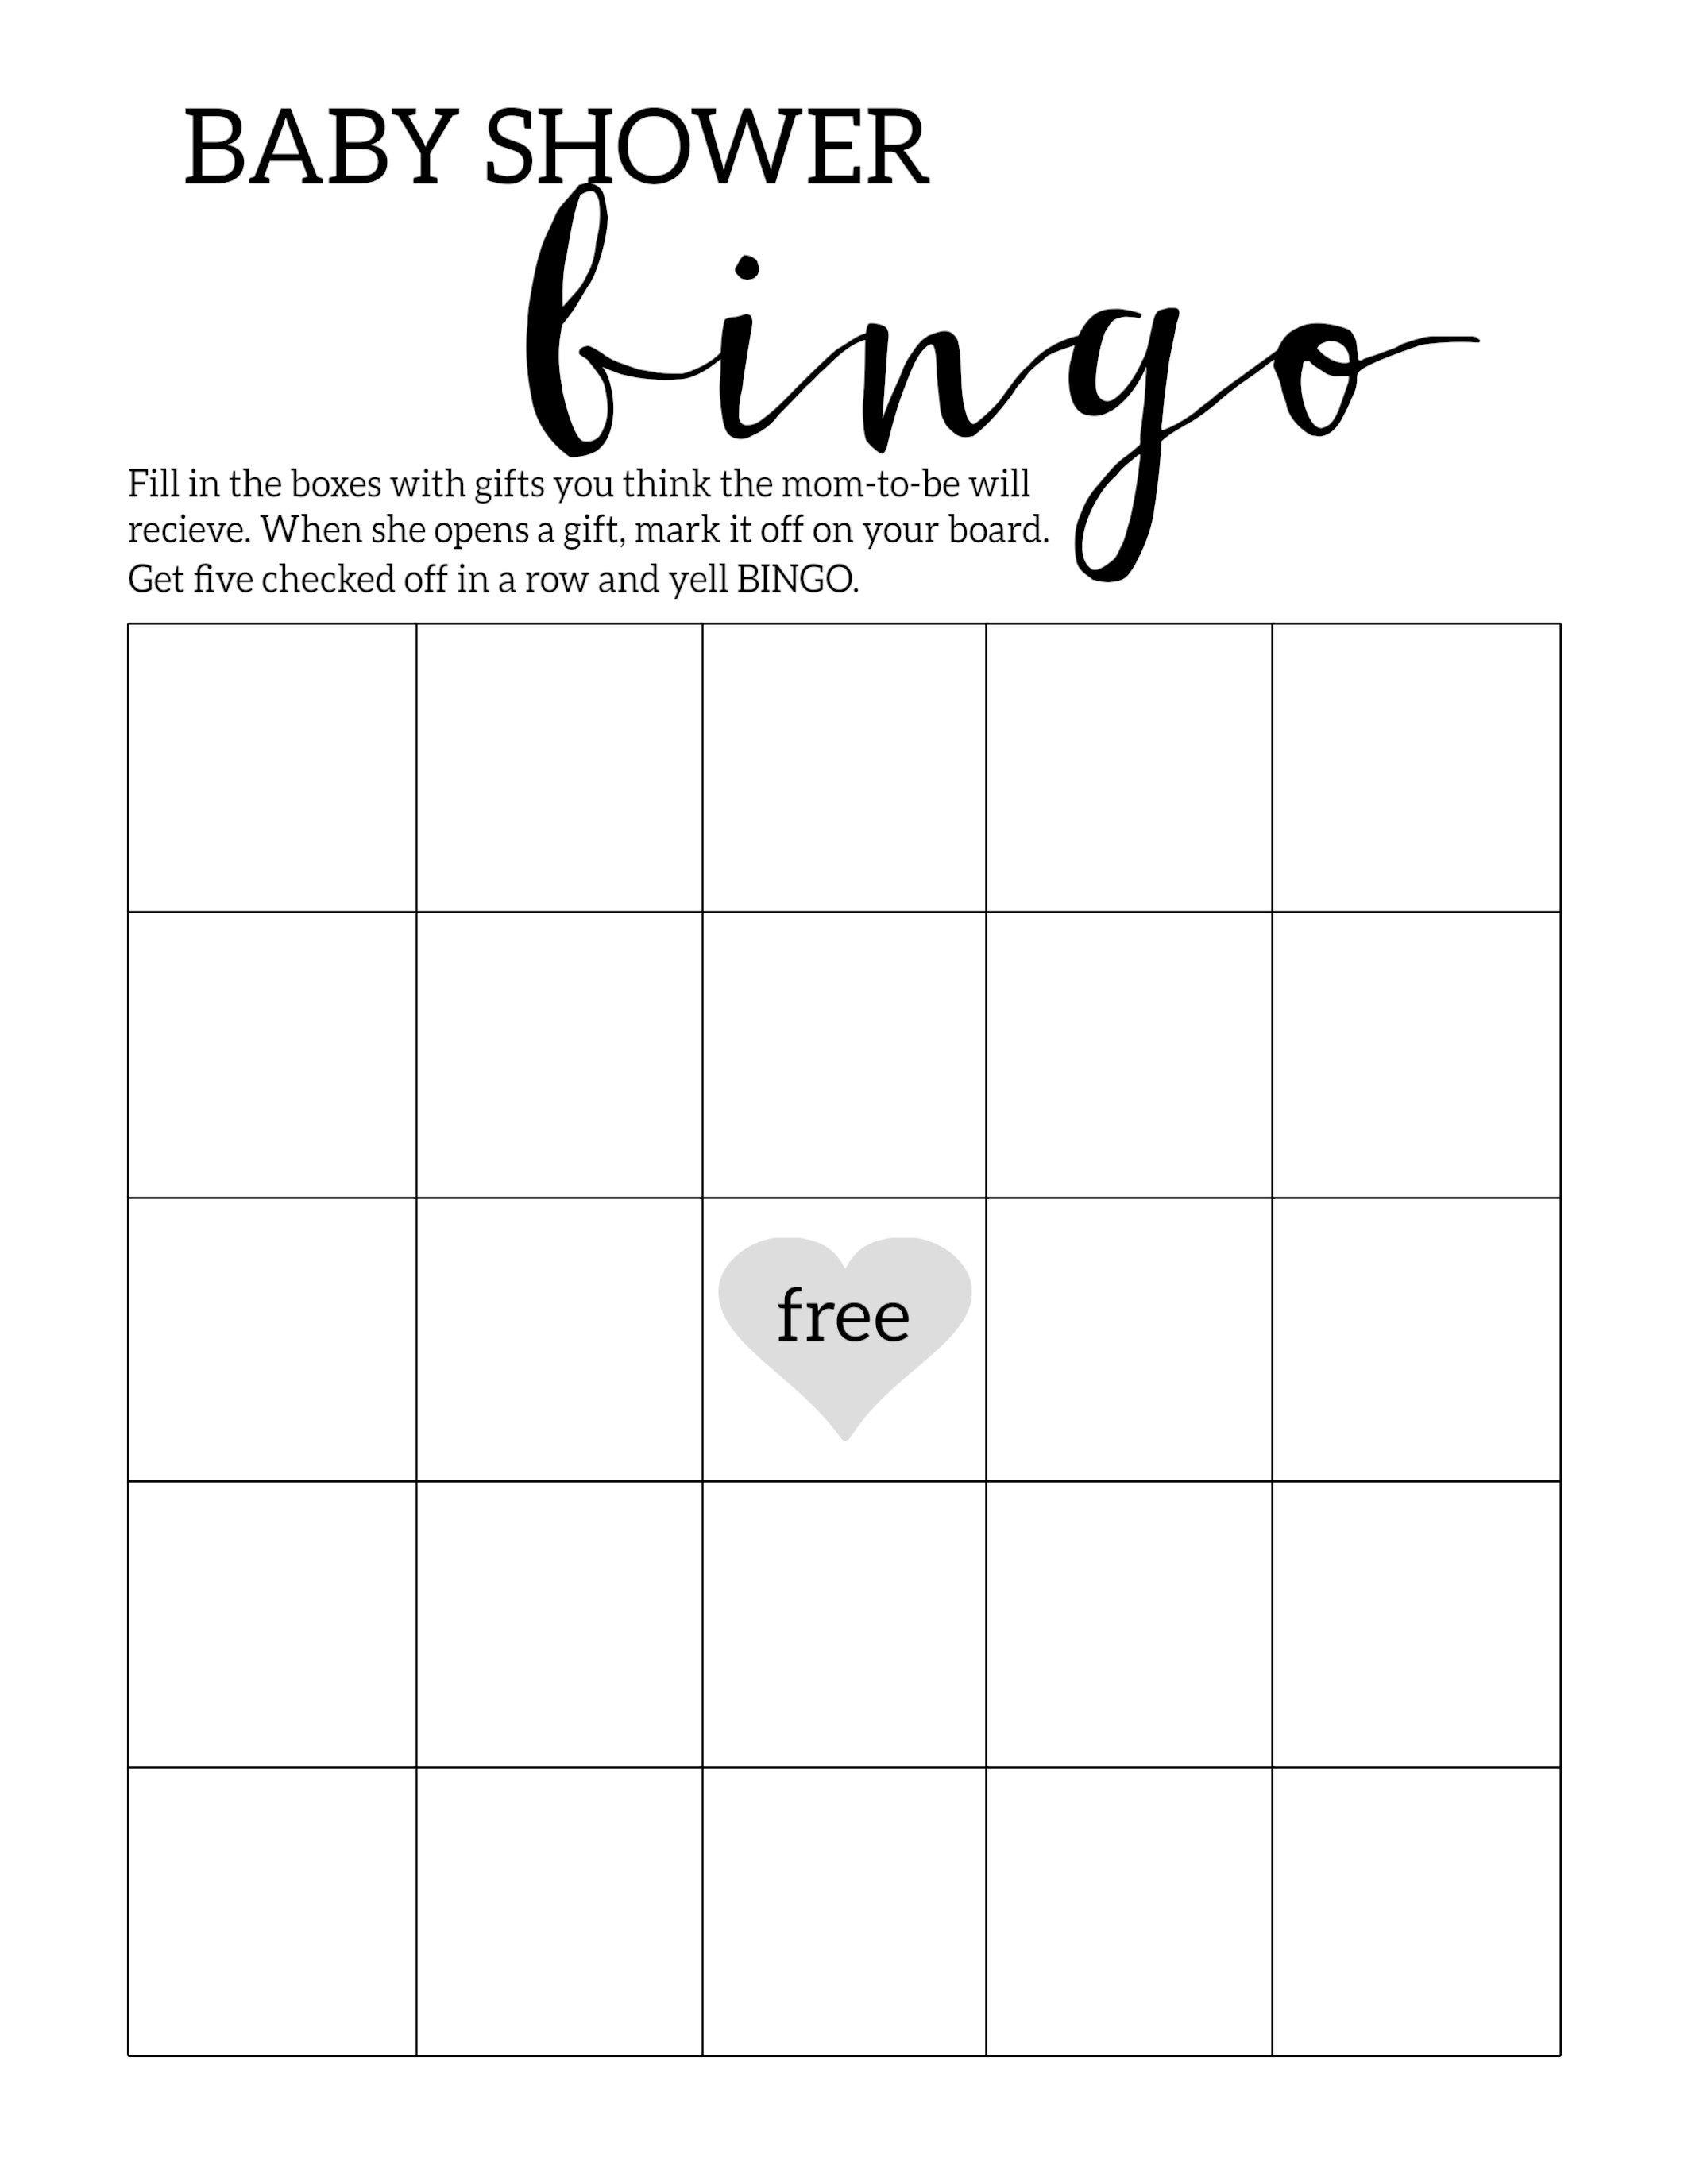 Baby Shower Bingo Printable Cards Template | Baby Shower | Baby - Free Printable Baby Shower Bingo